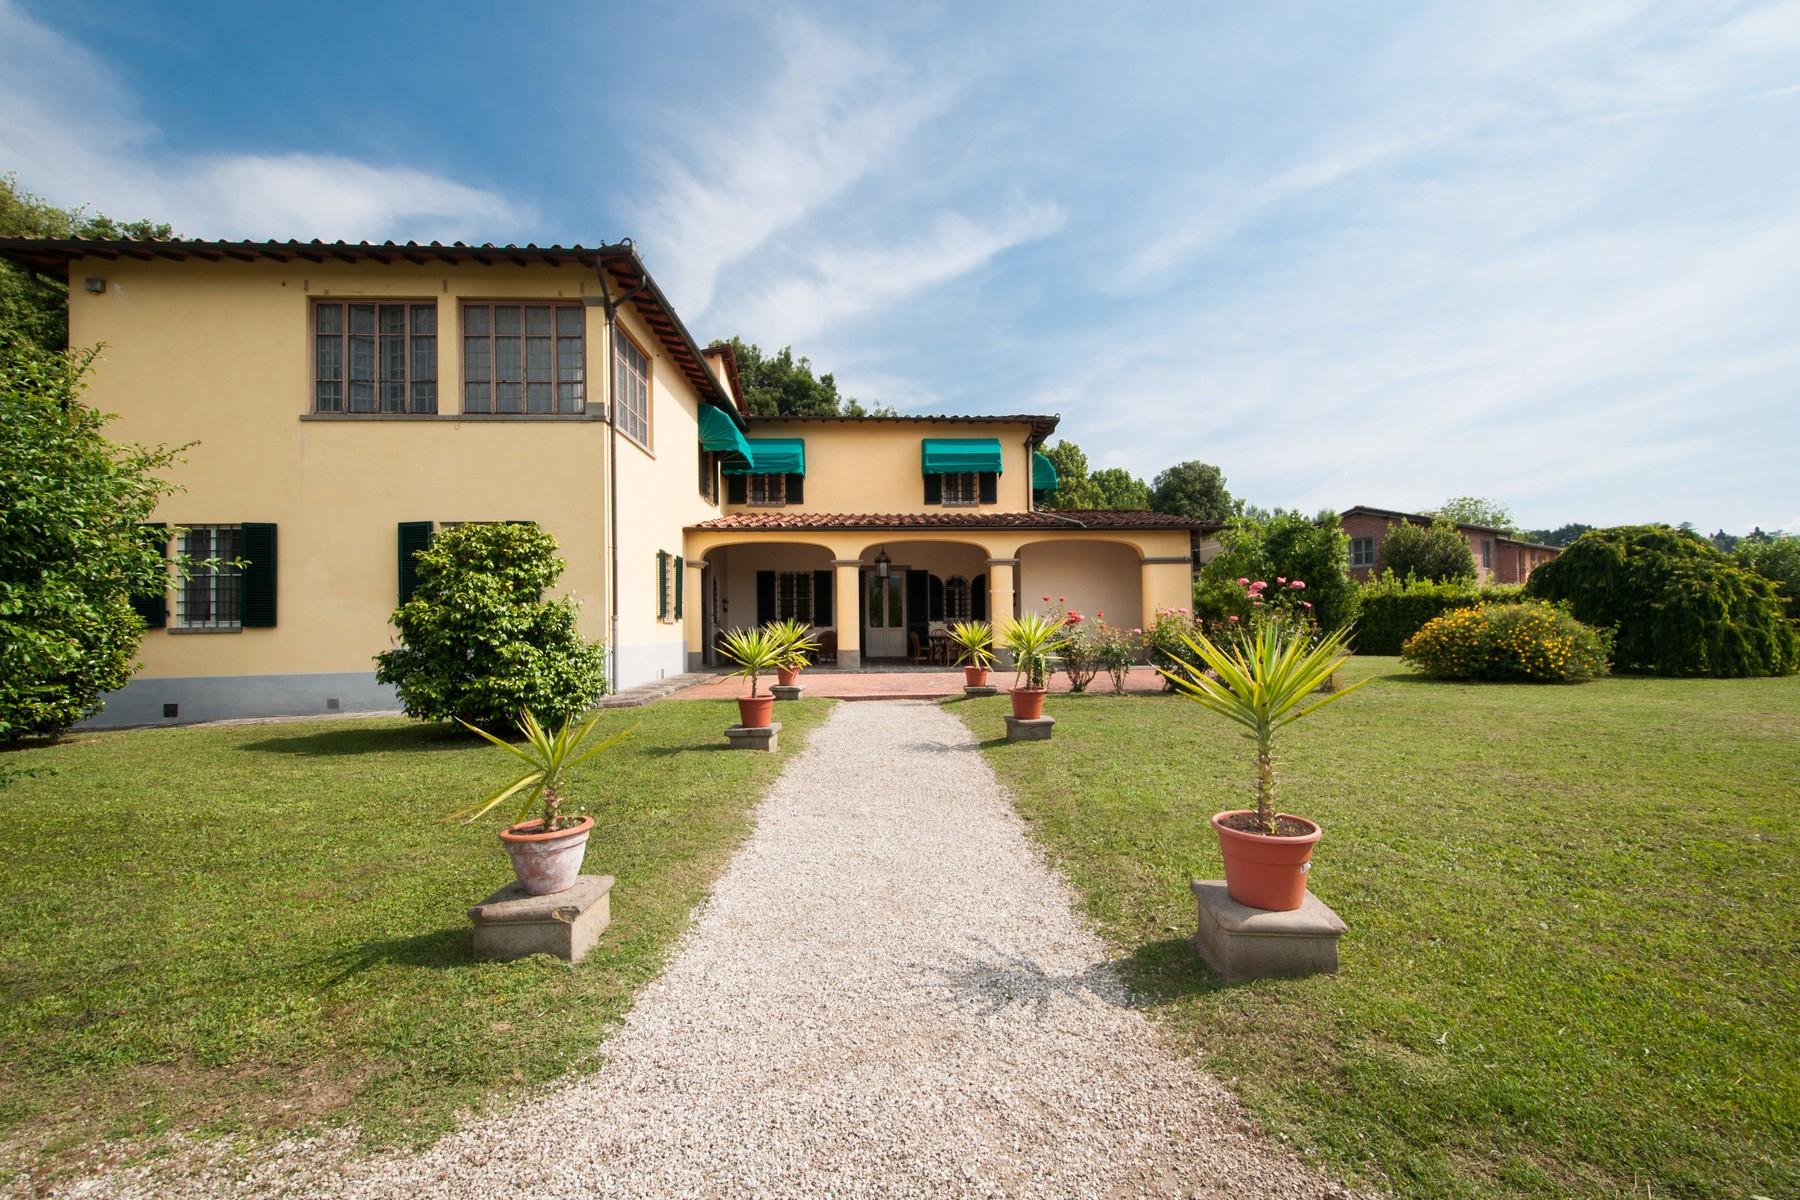 Villa in Vendita a Lucca: 5 locali, 400 mq - Foto 2